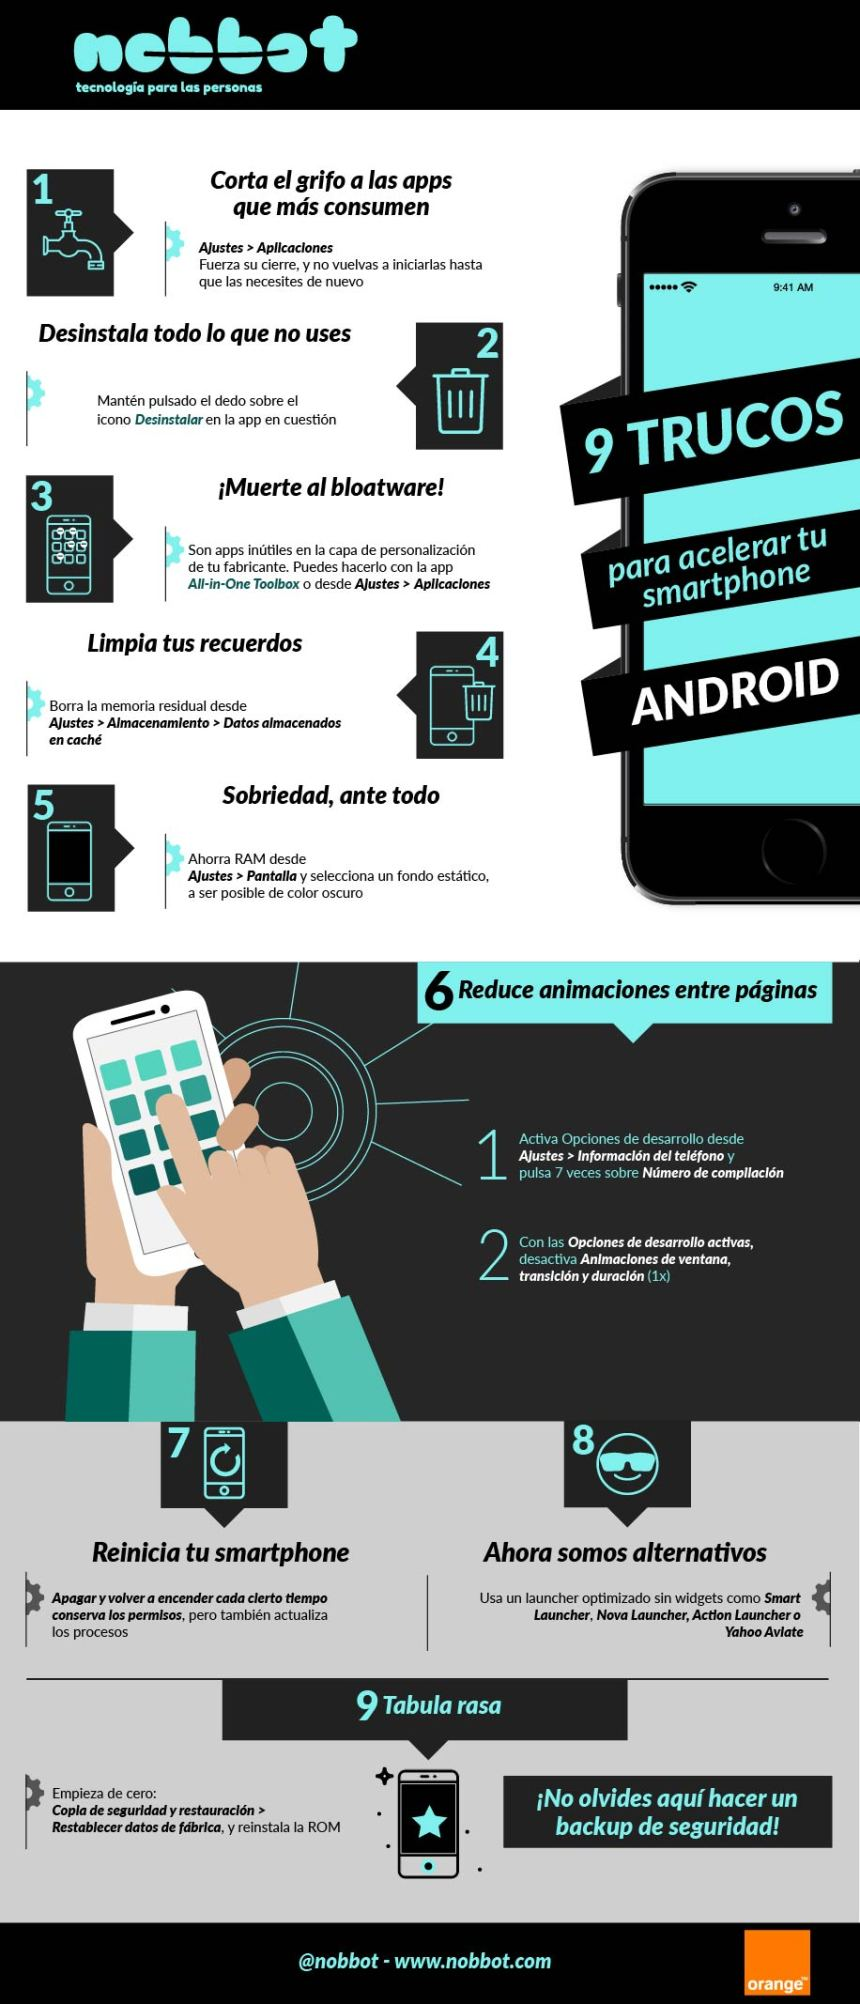 9 trucos para acelerar tu smartphone Android